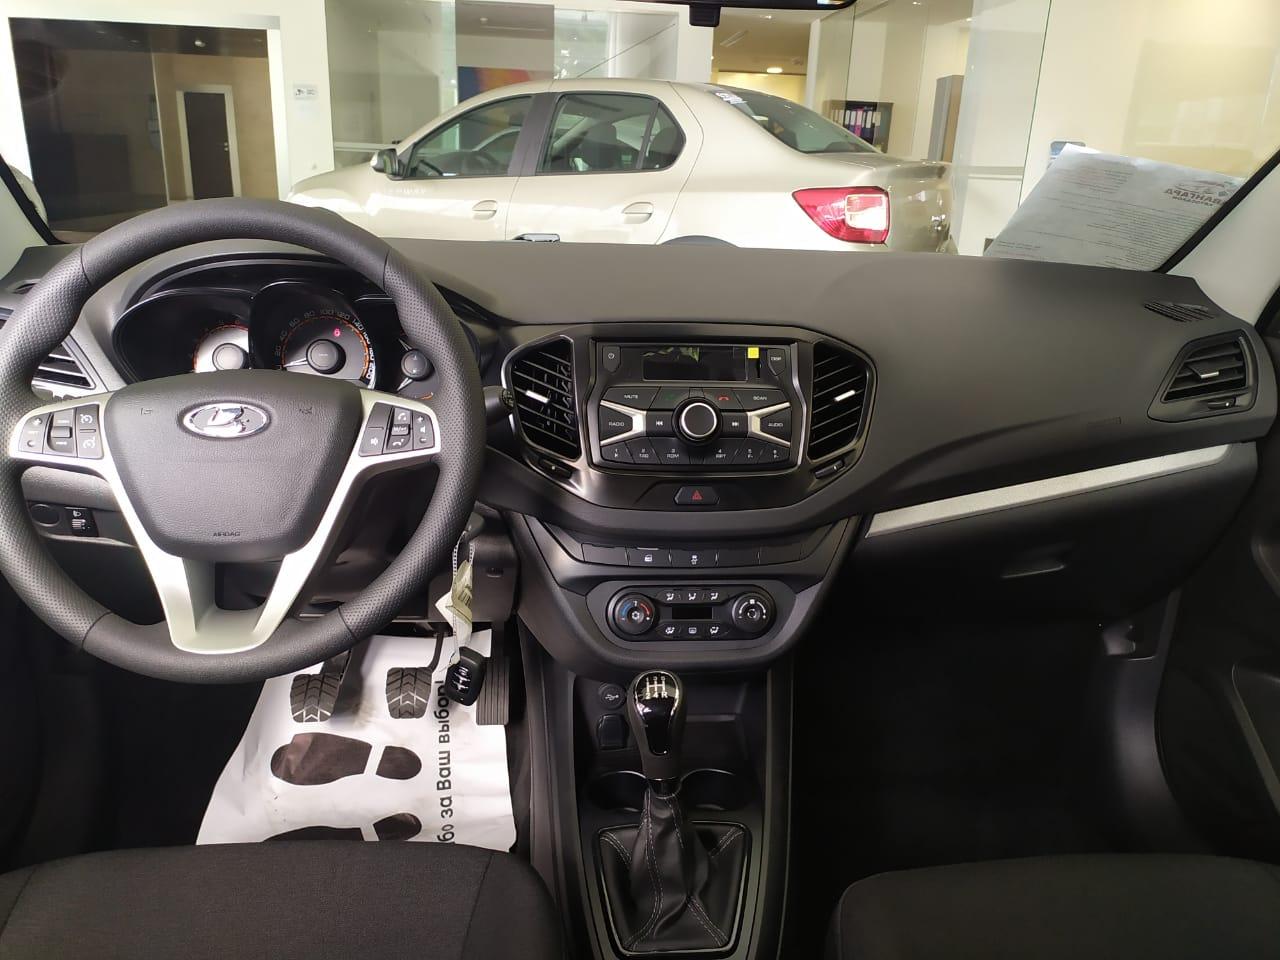 Lada Vesta SW (Лада Веста СВ) 1.6 л., 16-кл., (106 л.с.) Универсал Comfort 2020